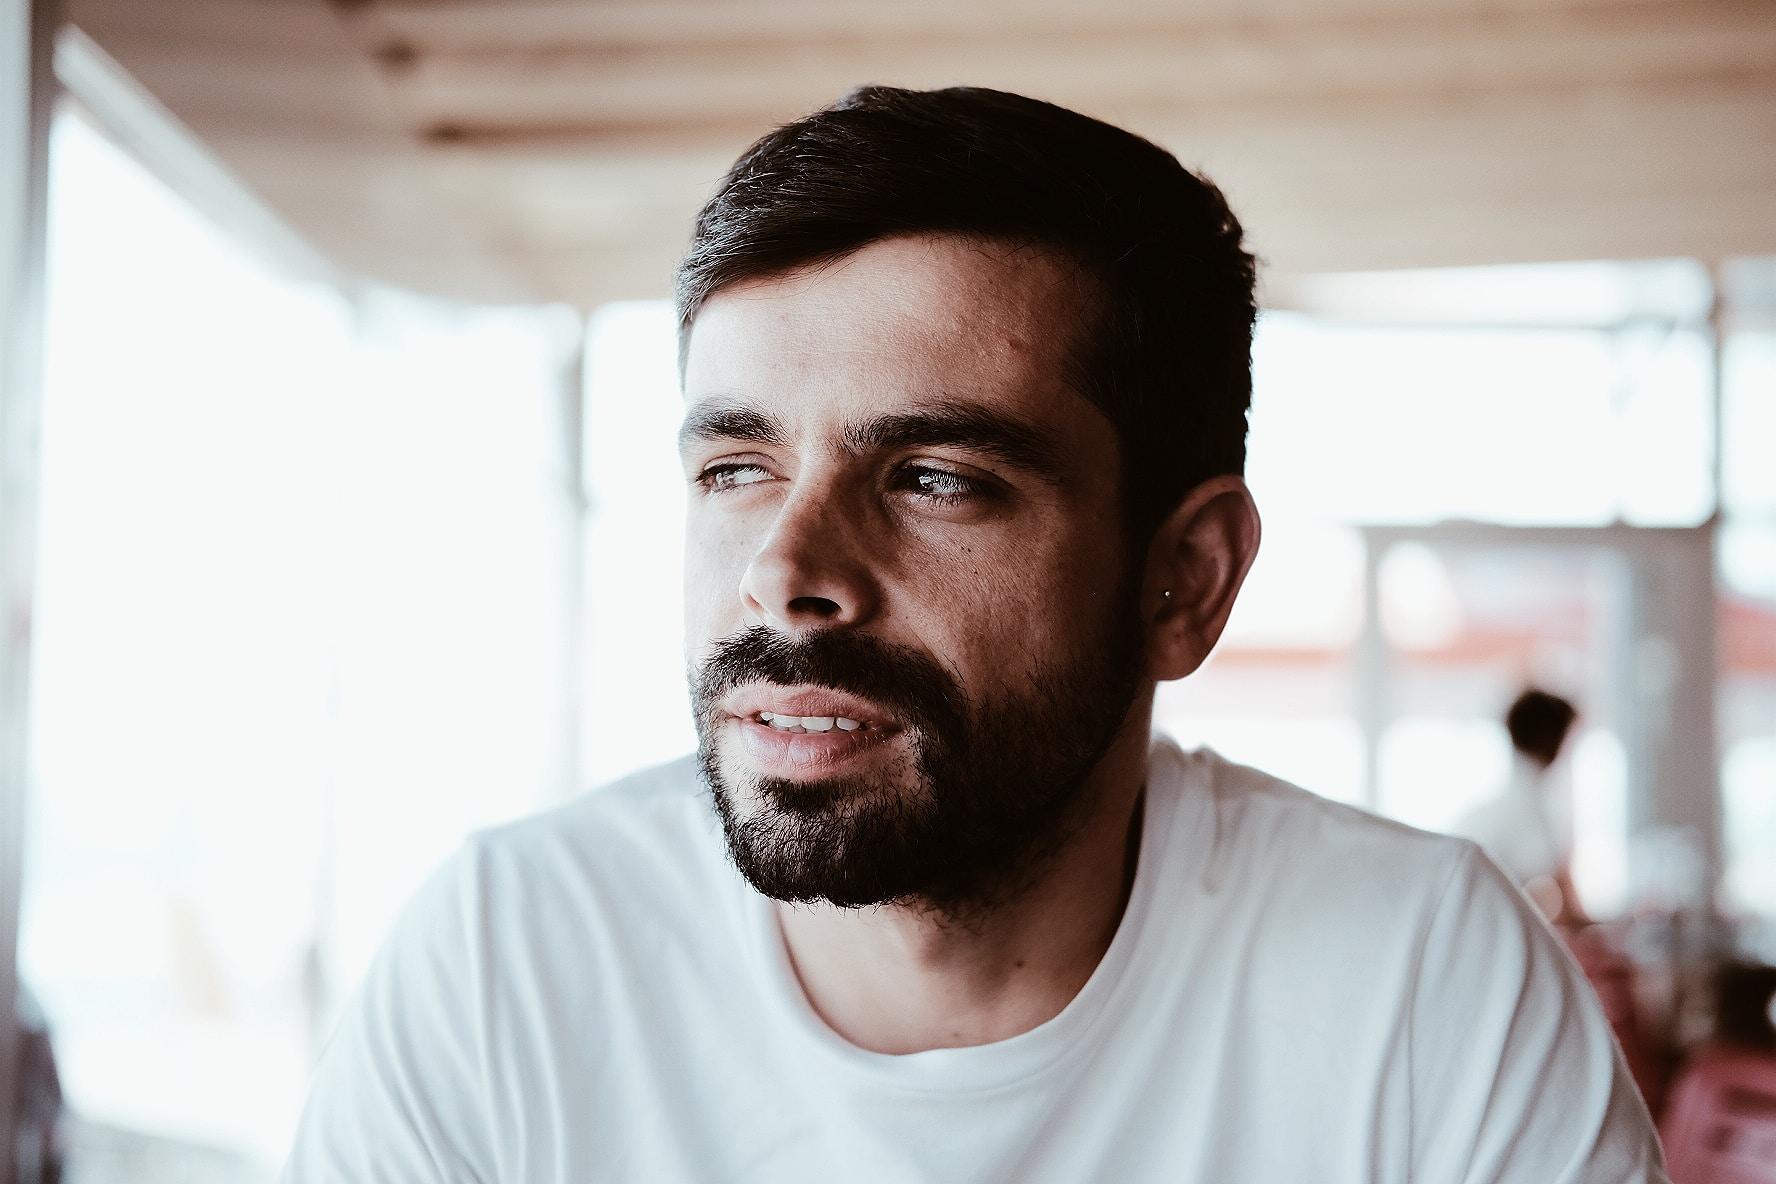 Go to Jorge Caetano's profile